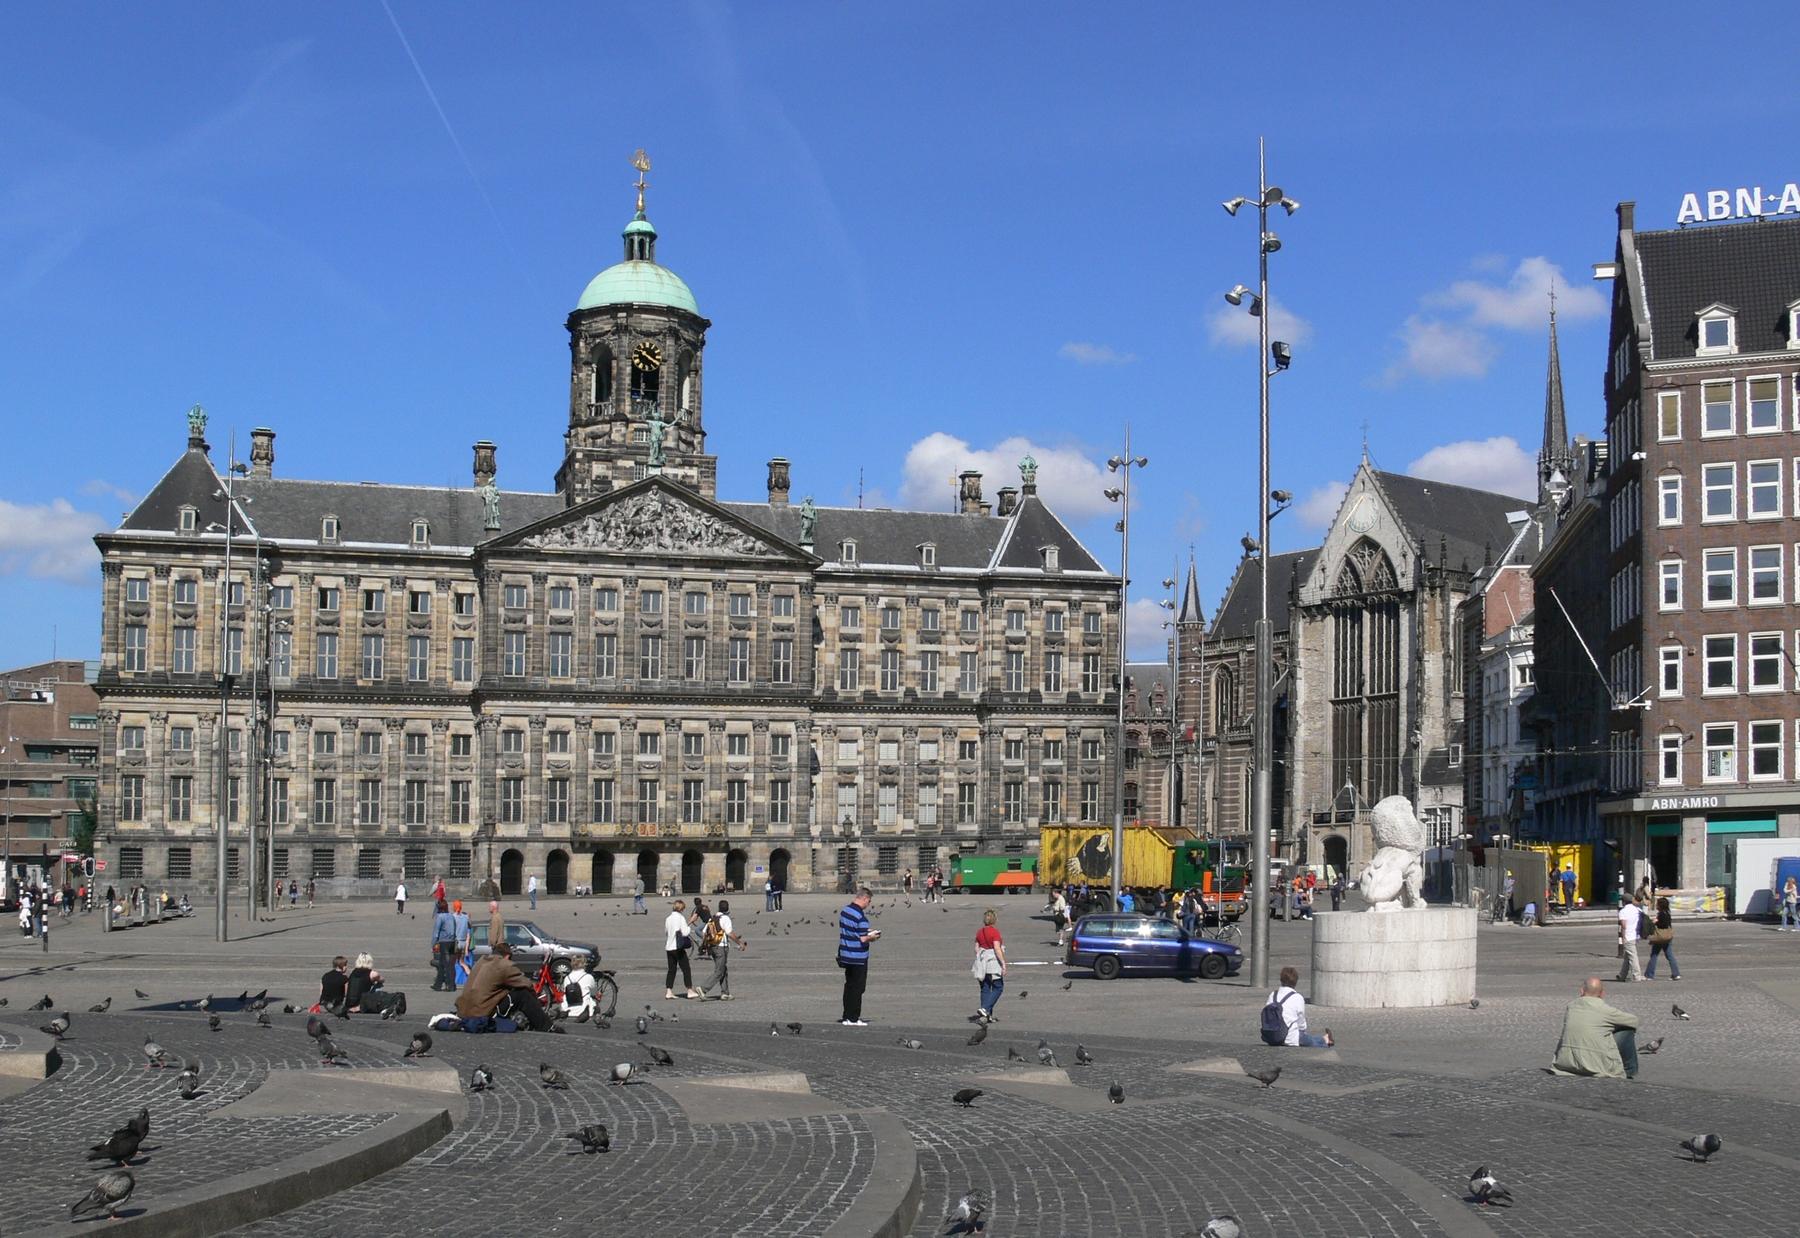 The Royal Palace in Amsterdam - אמסטרדם